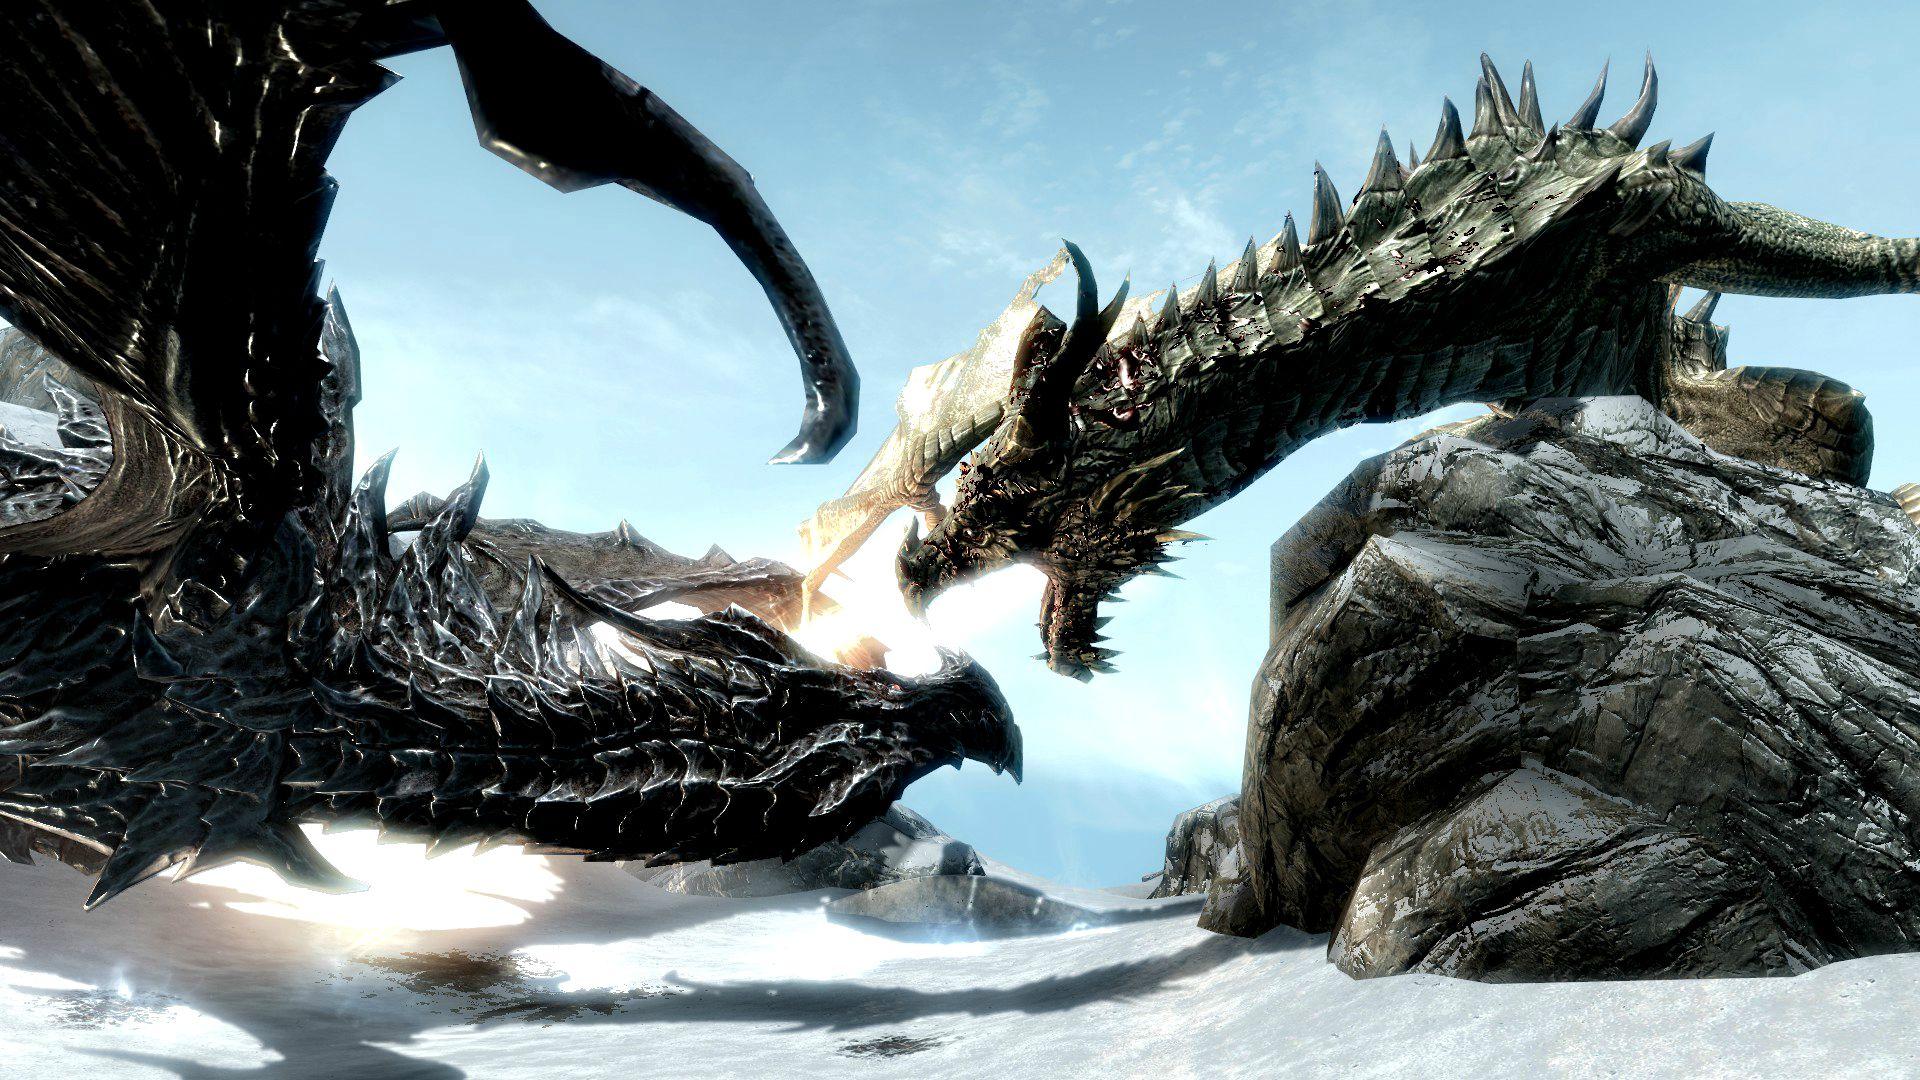 The Elder Scrolls V: Skyrim Full HD Wallpaper and Background Image | 1920x1080 | ID:294348